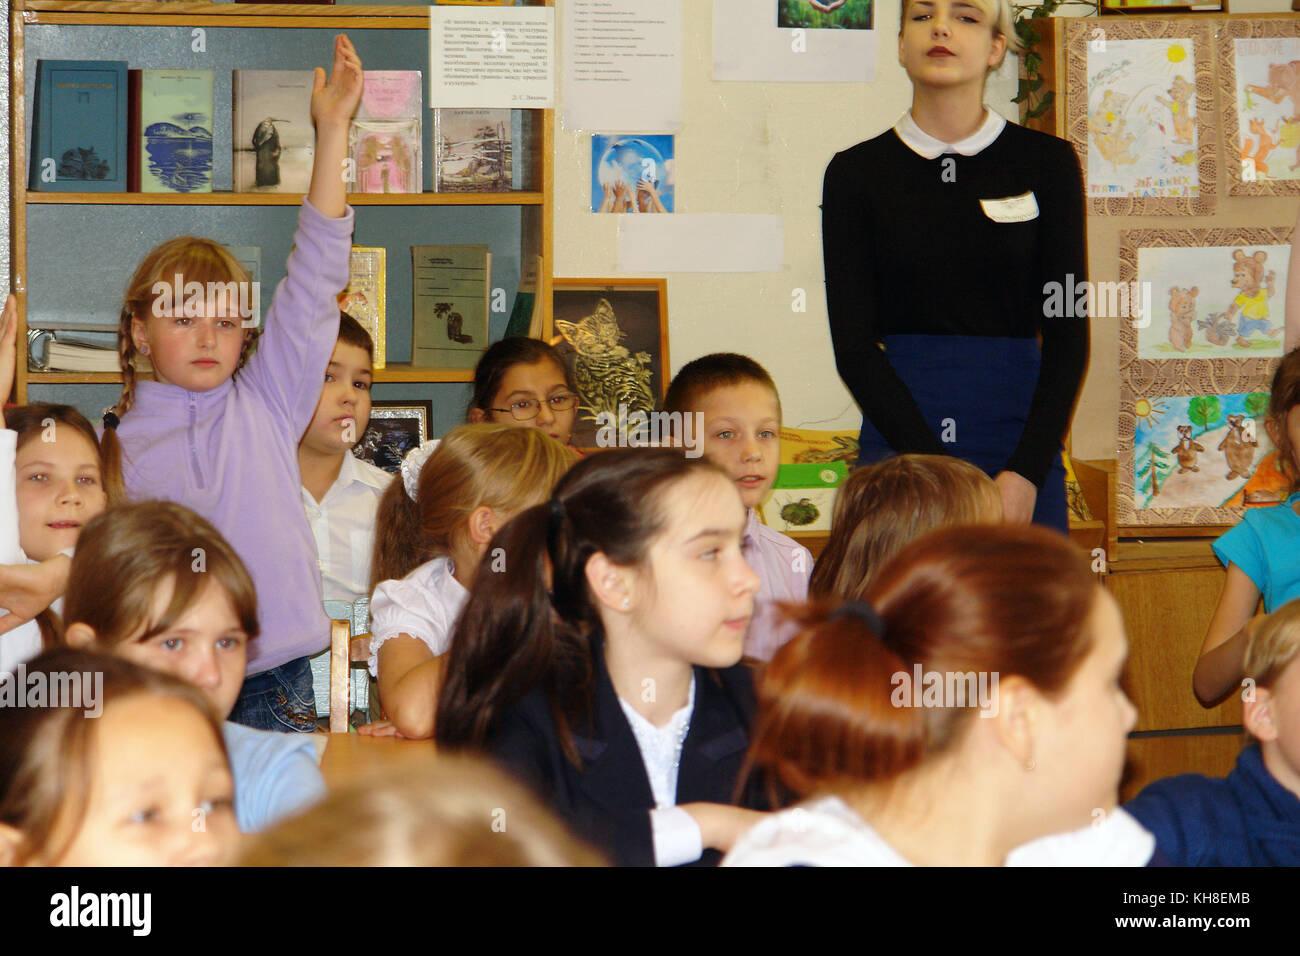 Schoolchildren in classroom at lesson - Stock Image